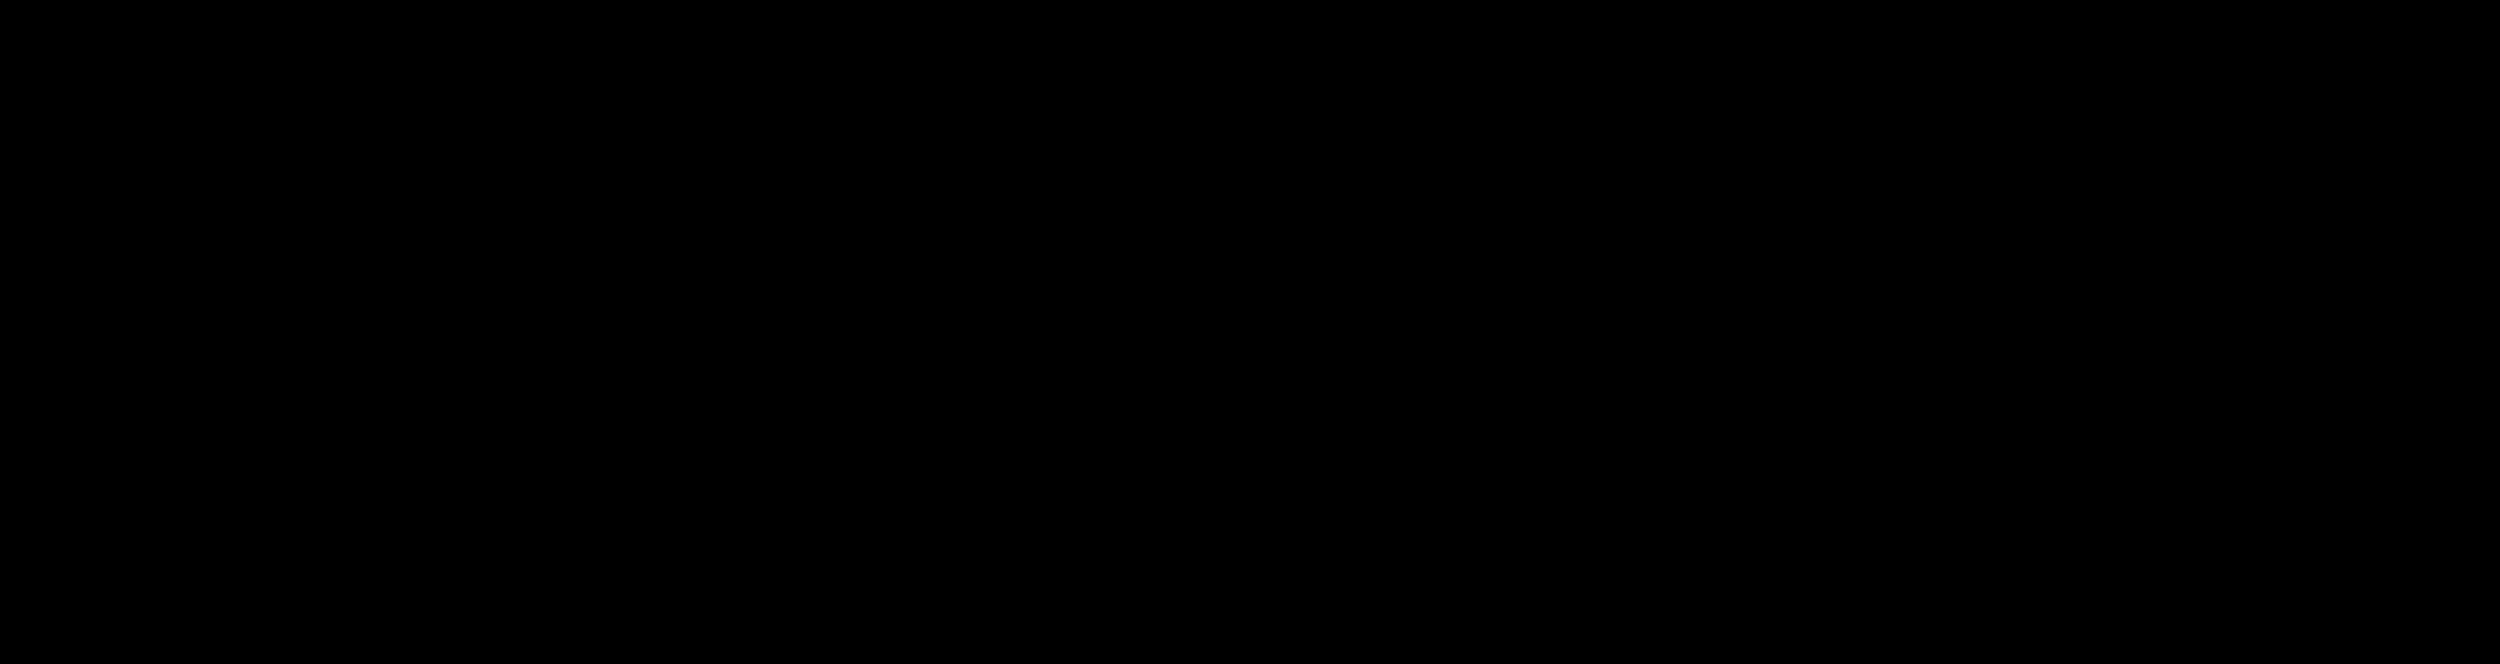 Esquire_logo.png